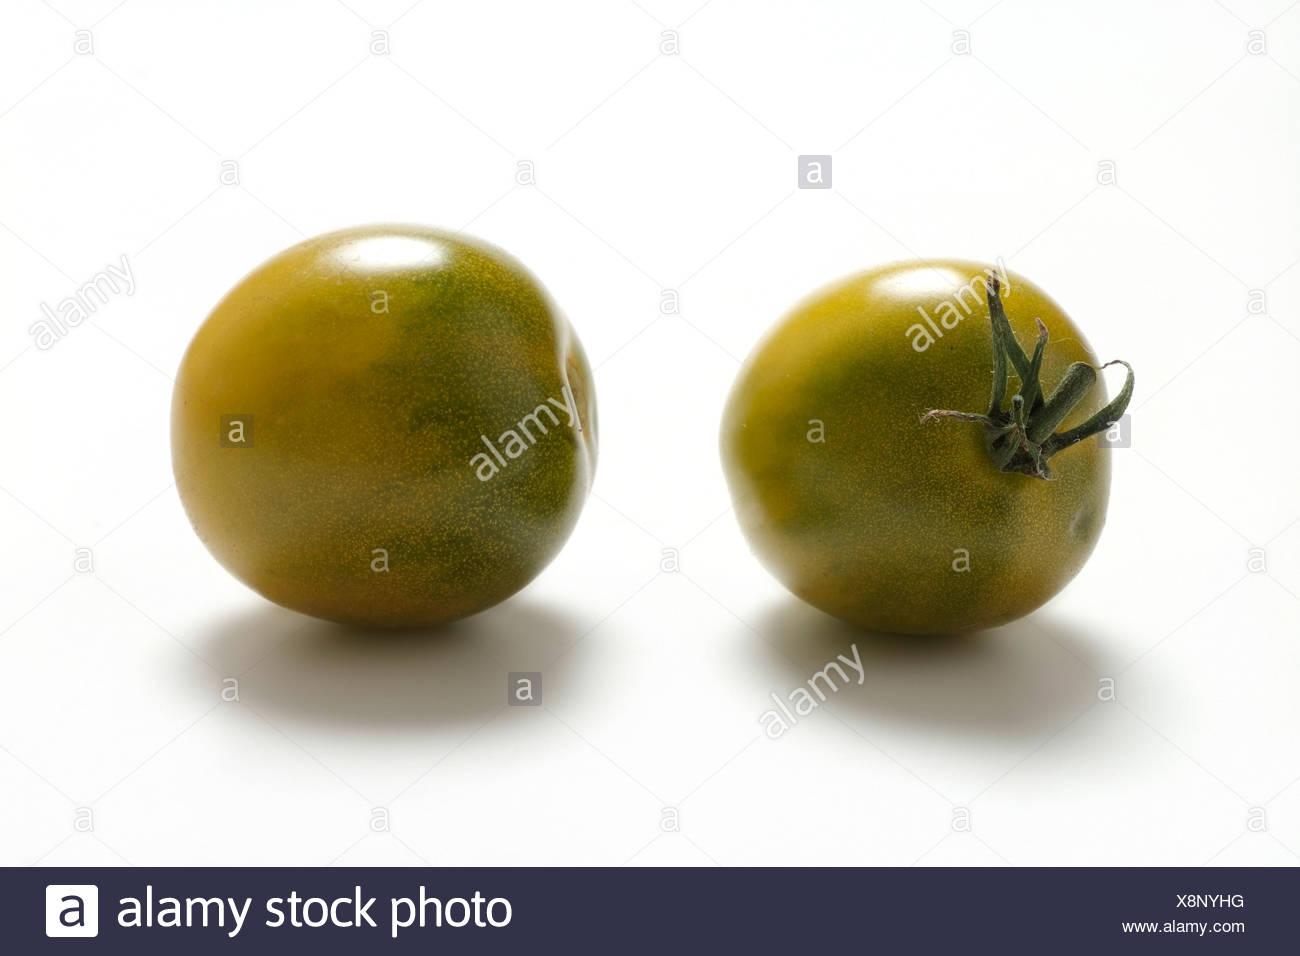 Tomato varieties: Green Grape - Stock Image